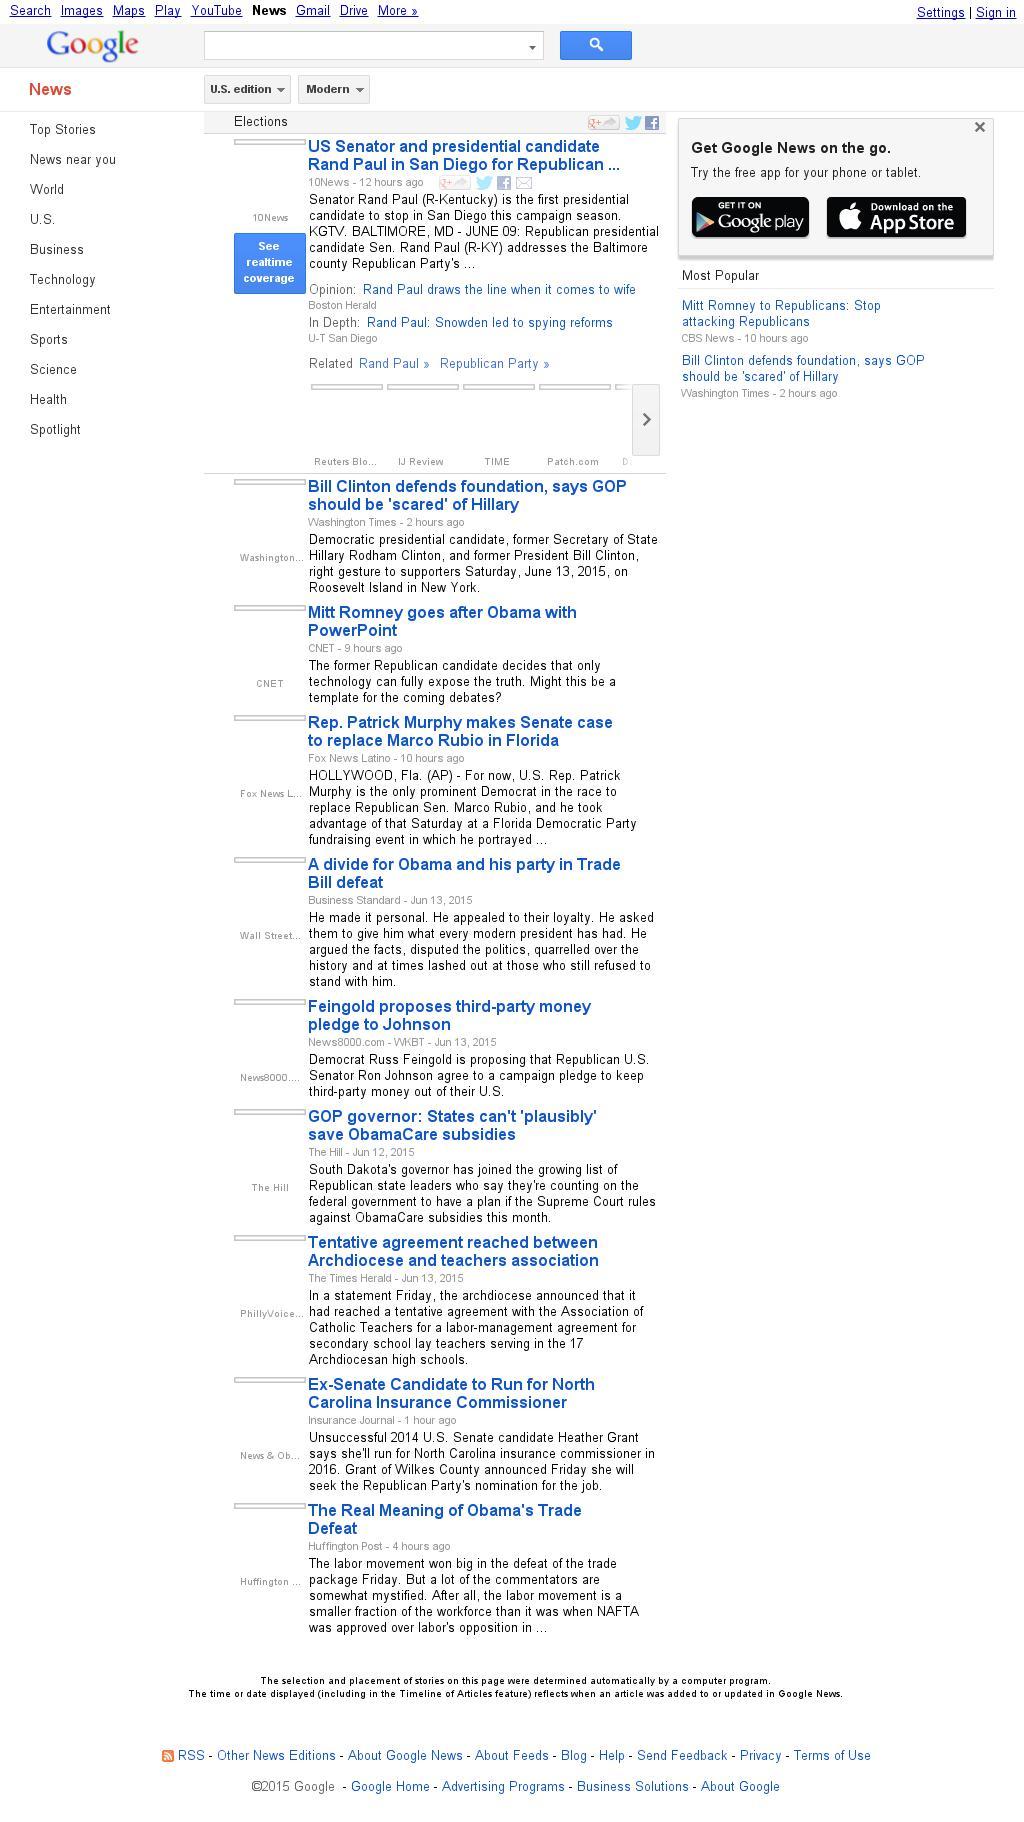 Google News: Elections at Monday June 15, 2015, 6:11 a.m. UTC